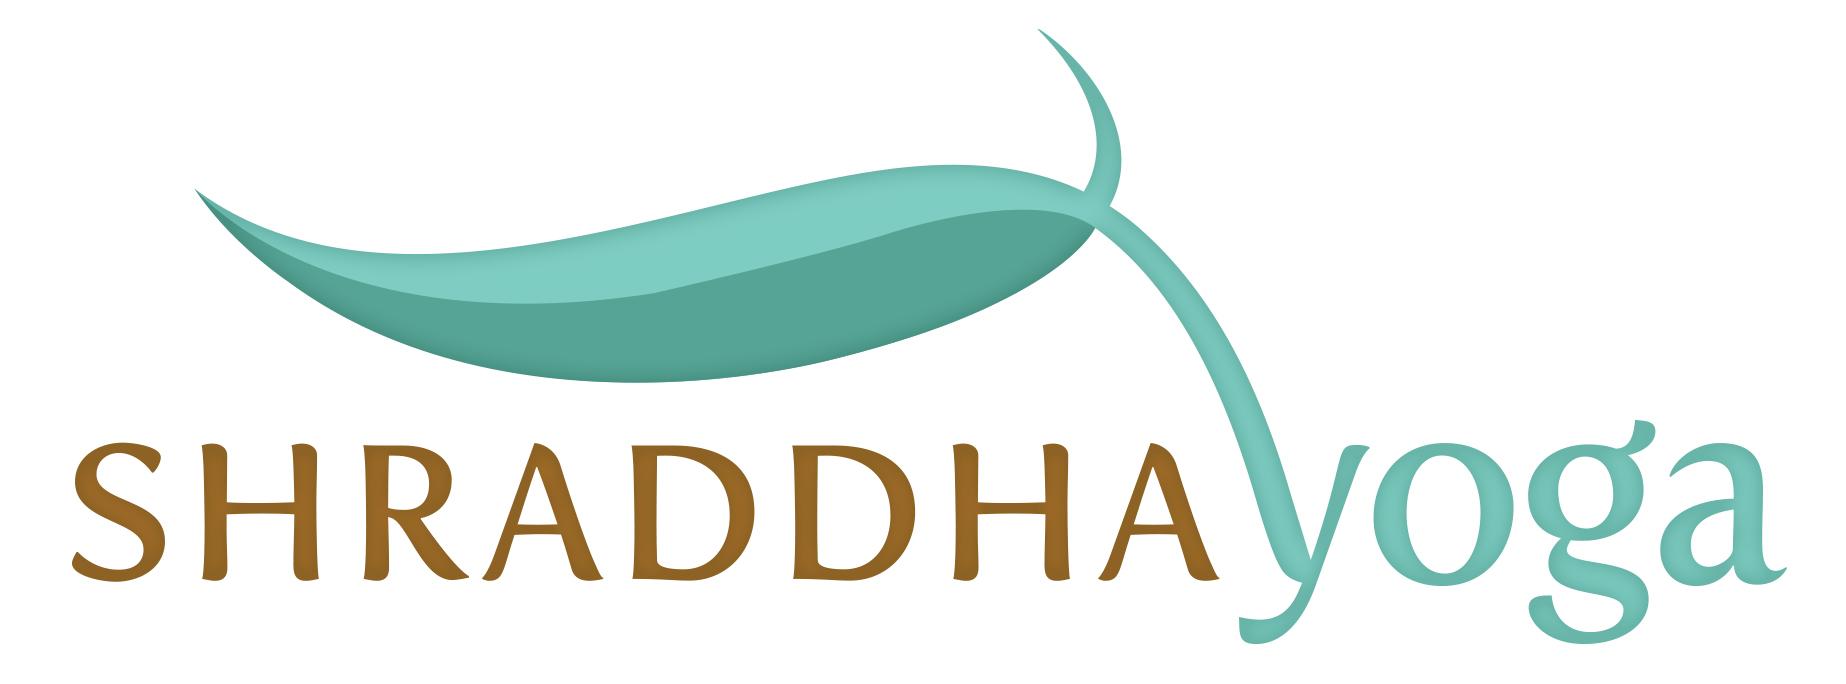 Shraddha Yoga